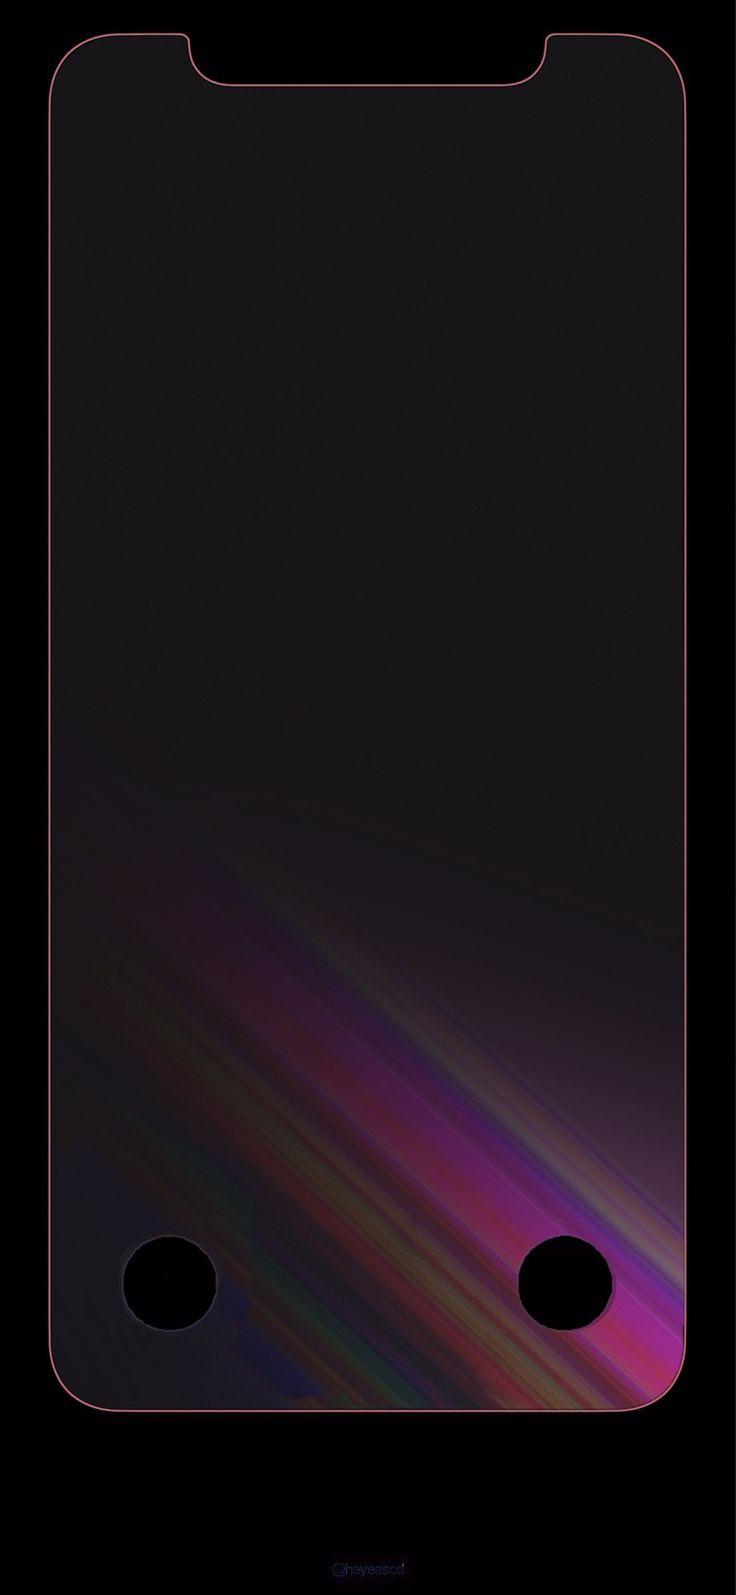 Iphone X Wallpaper 458733912040627373 Iphone Wallpaper Apple Wallpaper Iphone Hd Wallpaper Iphone